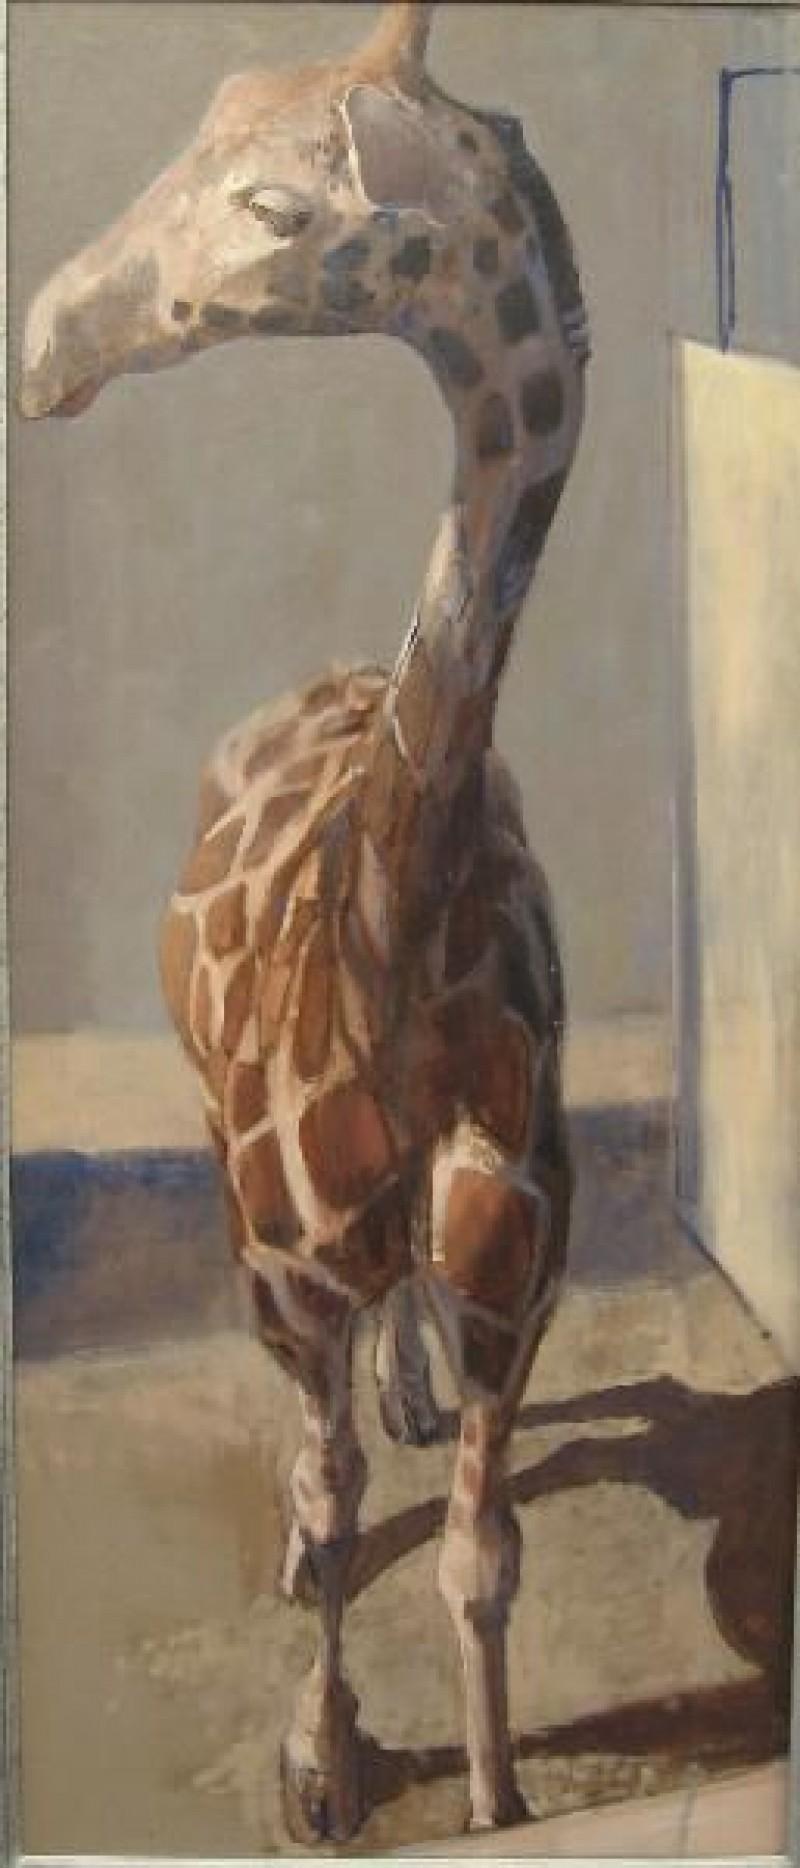 - Giraffe